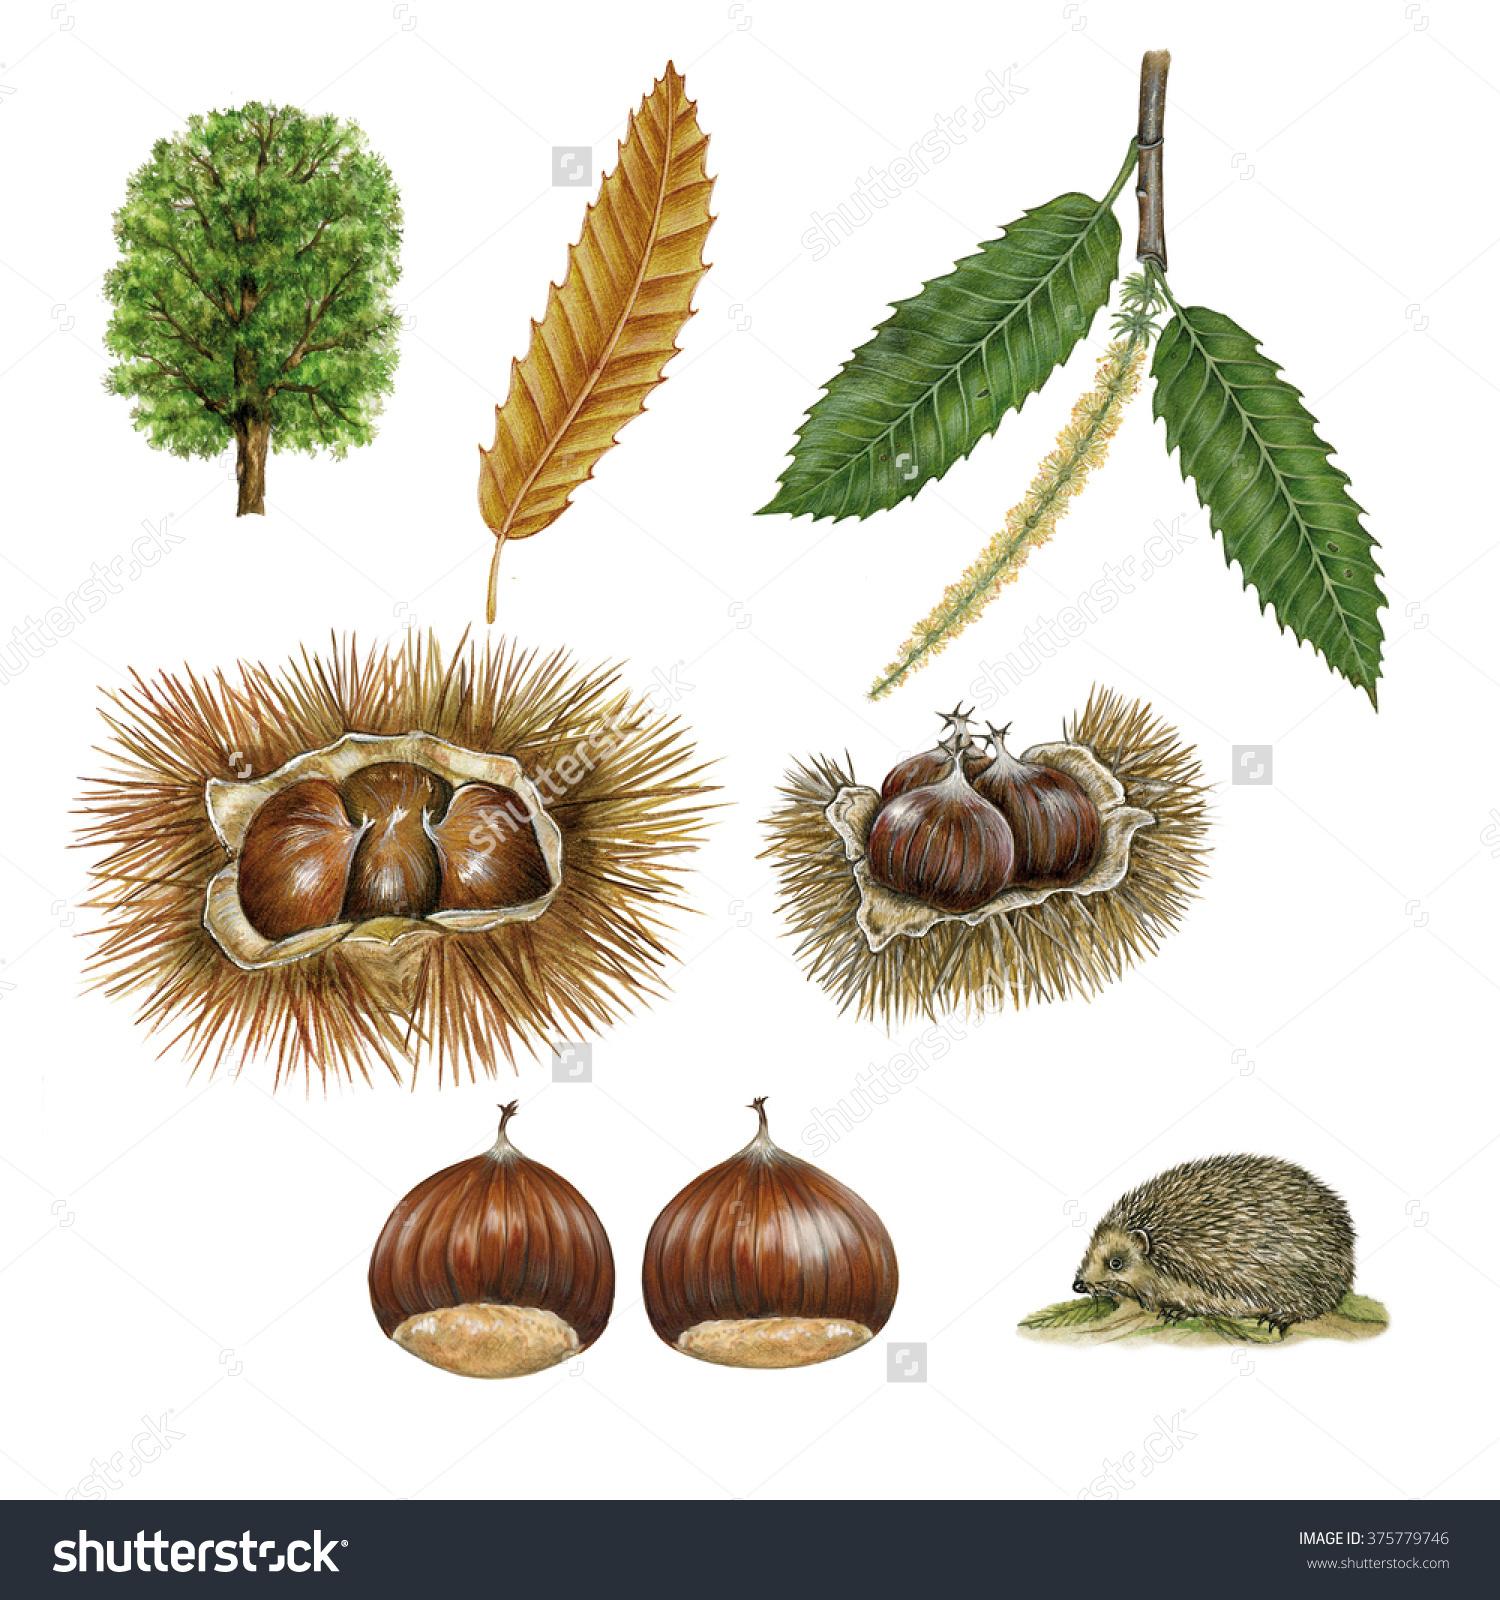 Realistic Botanic Illustrations Chestnut Castanea Sativa Stock.